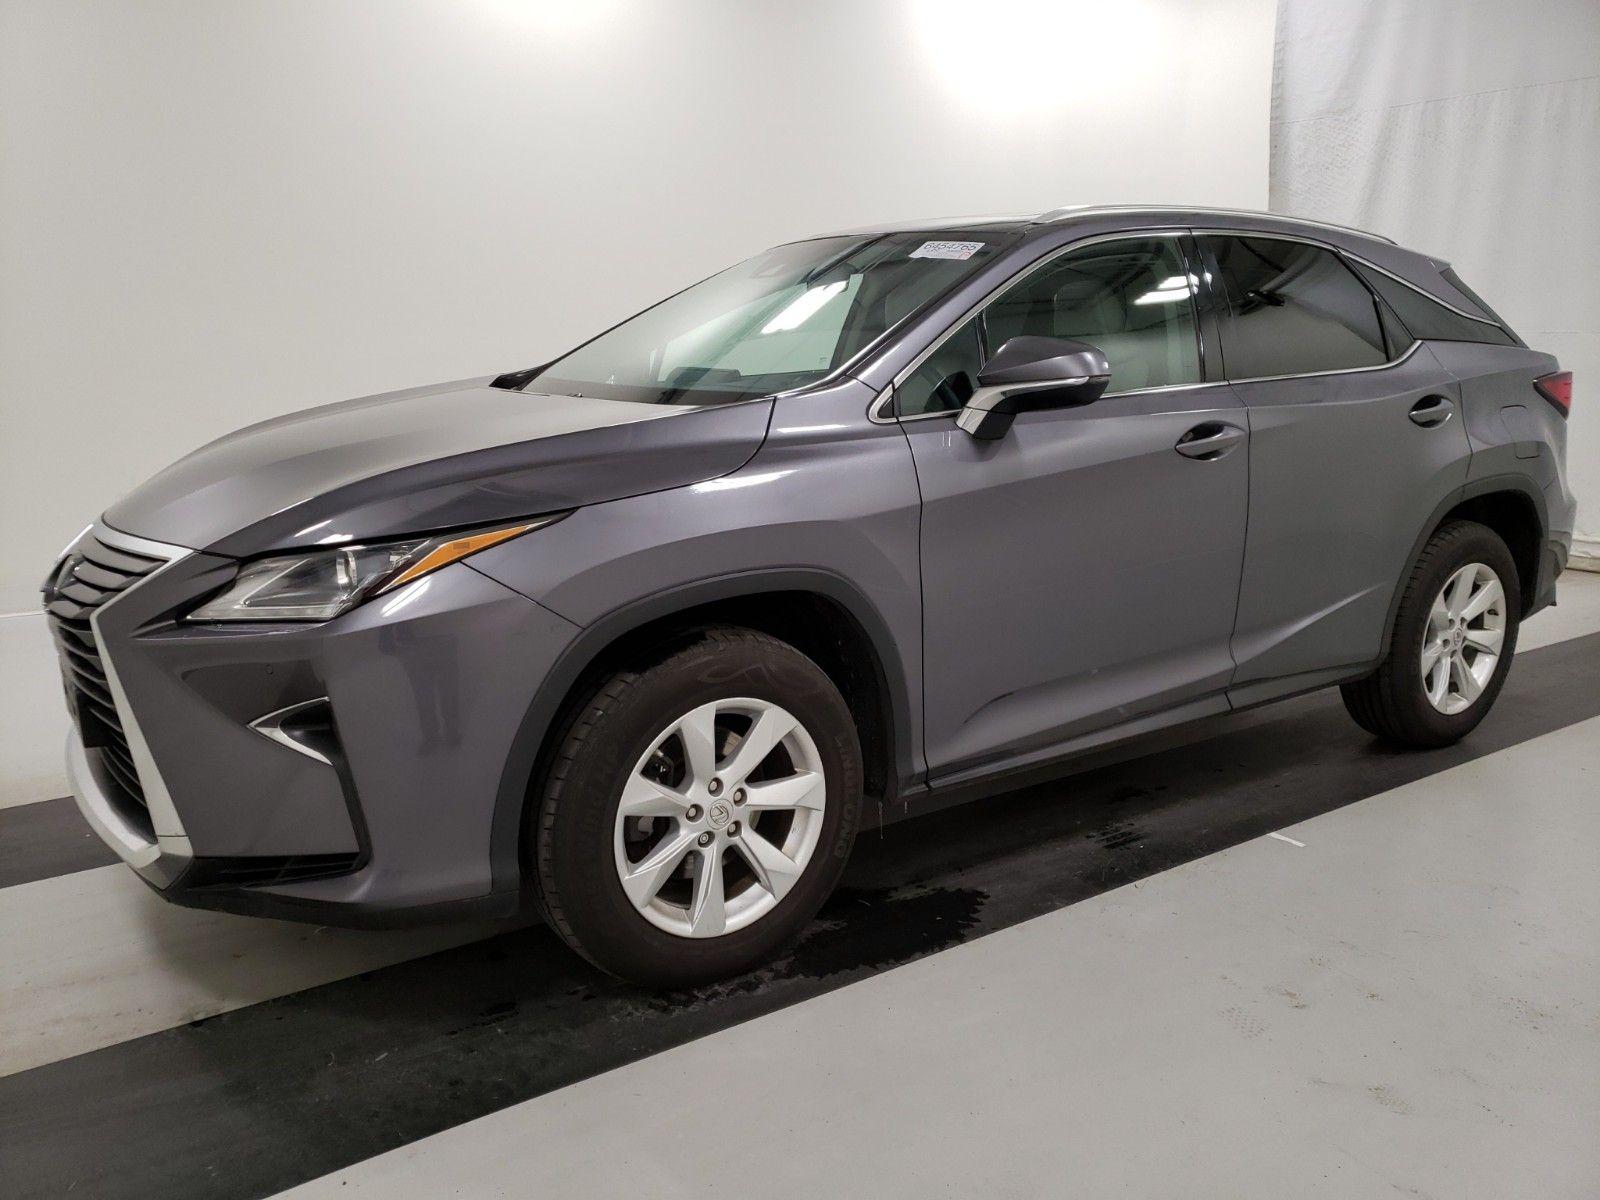 2017 Lexus Rx 3.5. Lot 99921010654 Vin 2T2BZMCA4HC070558